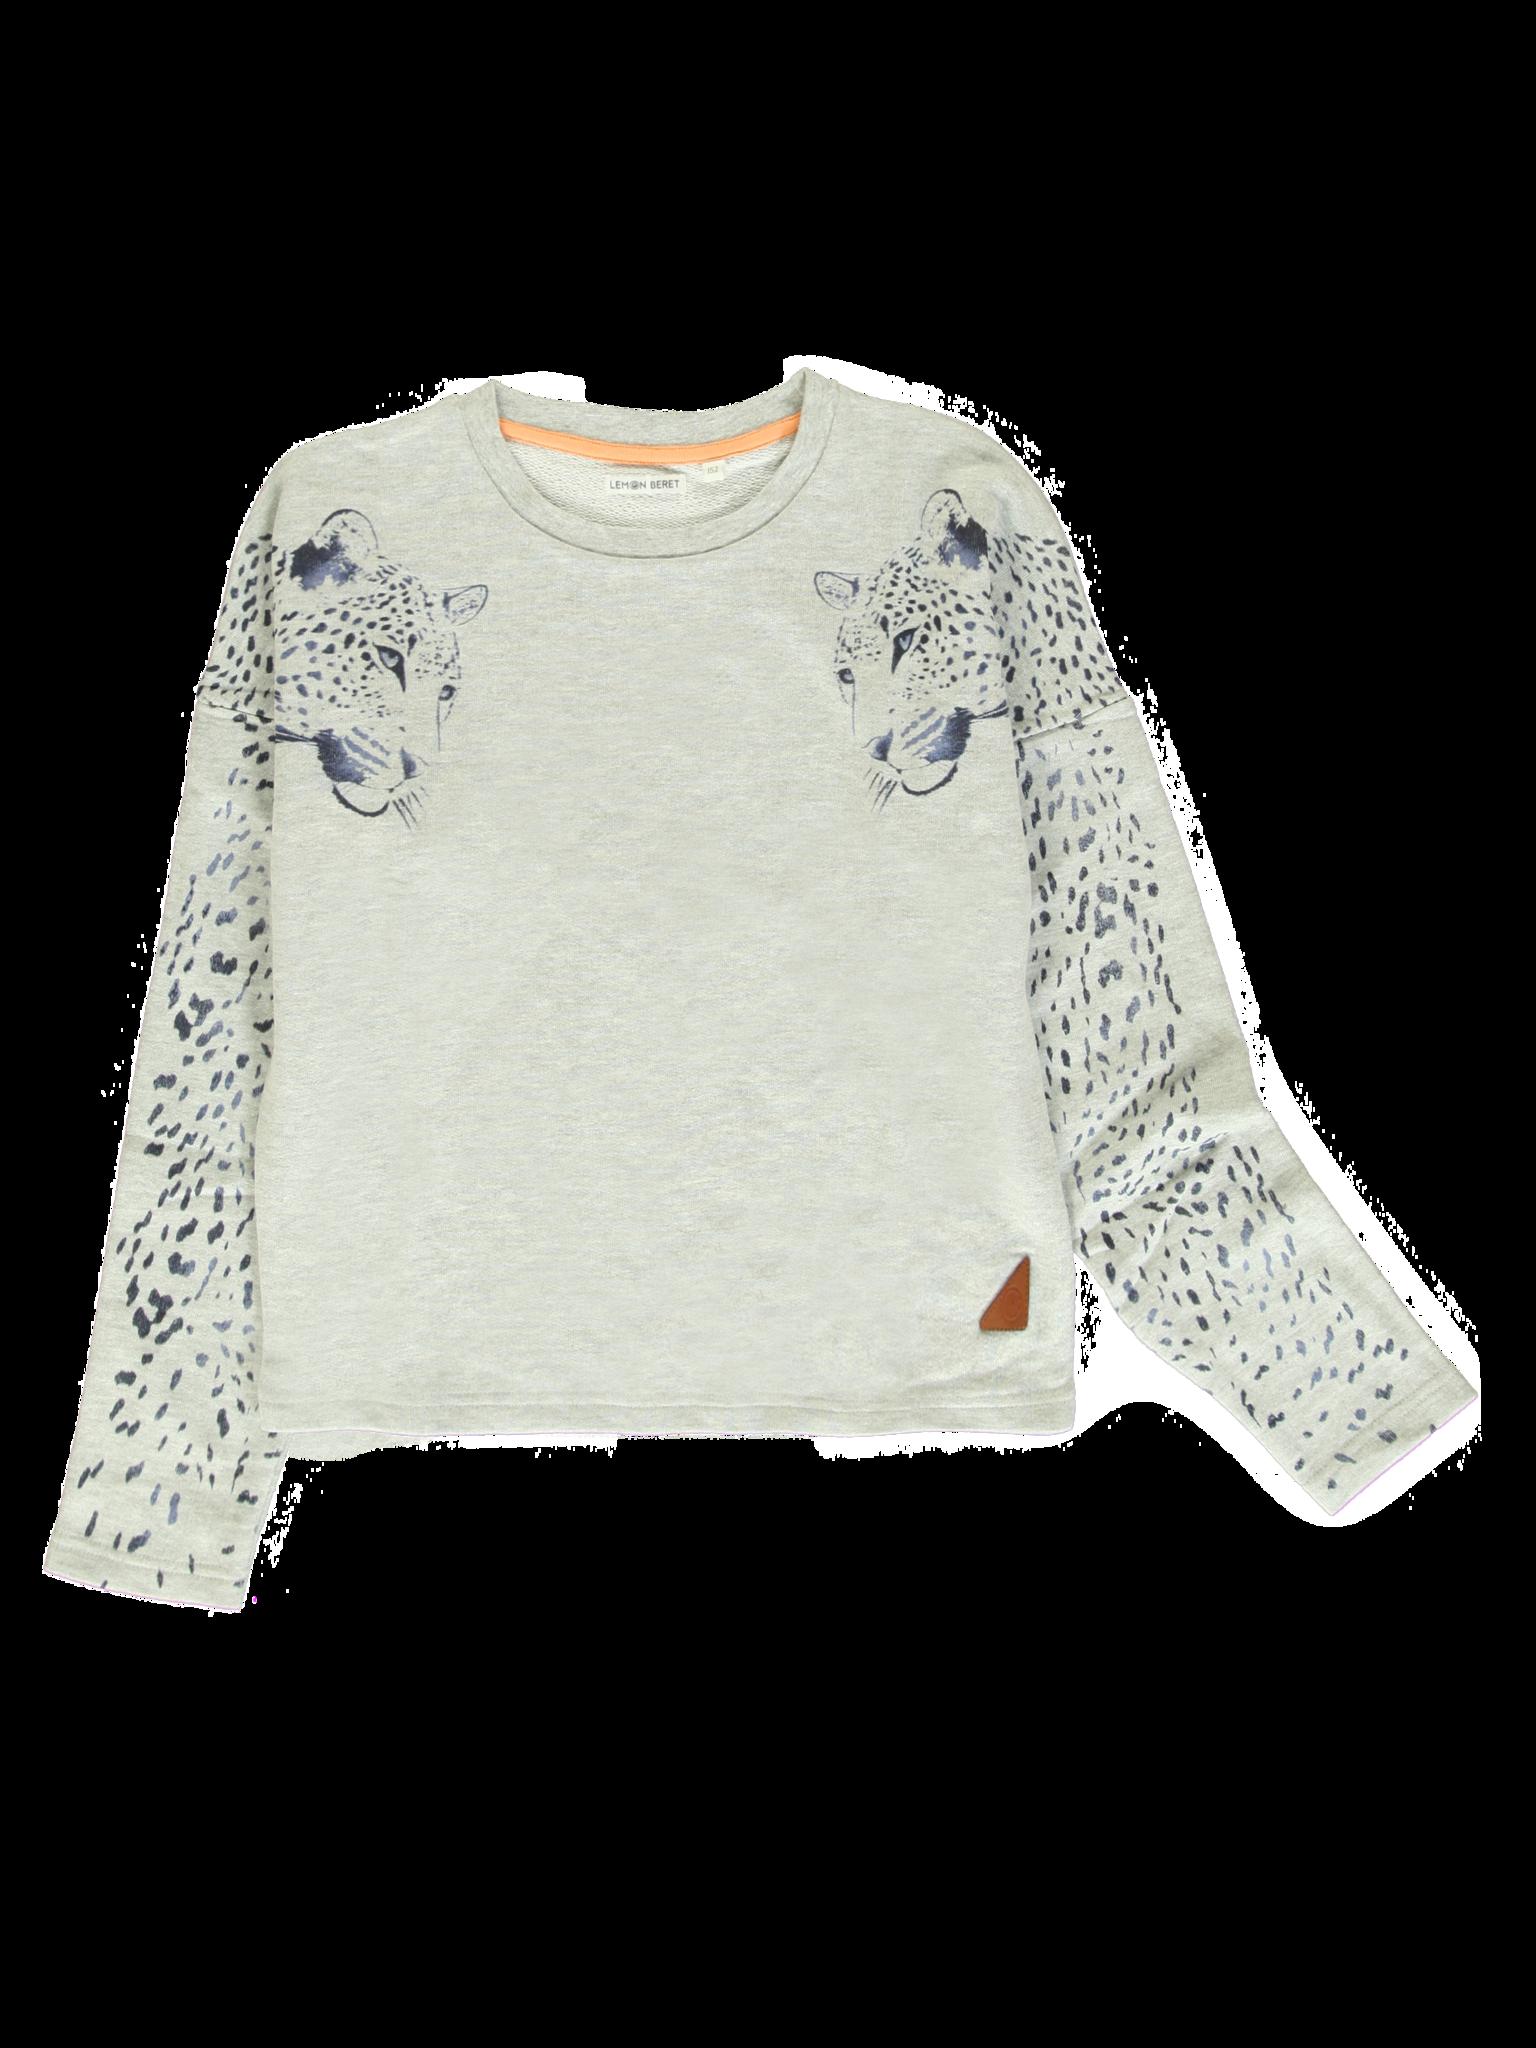 All Brands | Winterproducts Teen Girls | Sweatshirt | 12 pcs/box